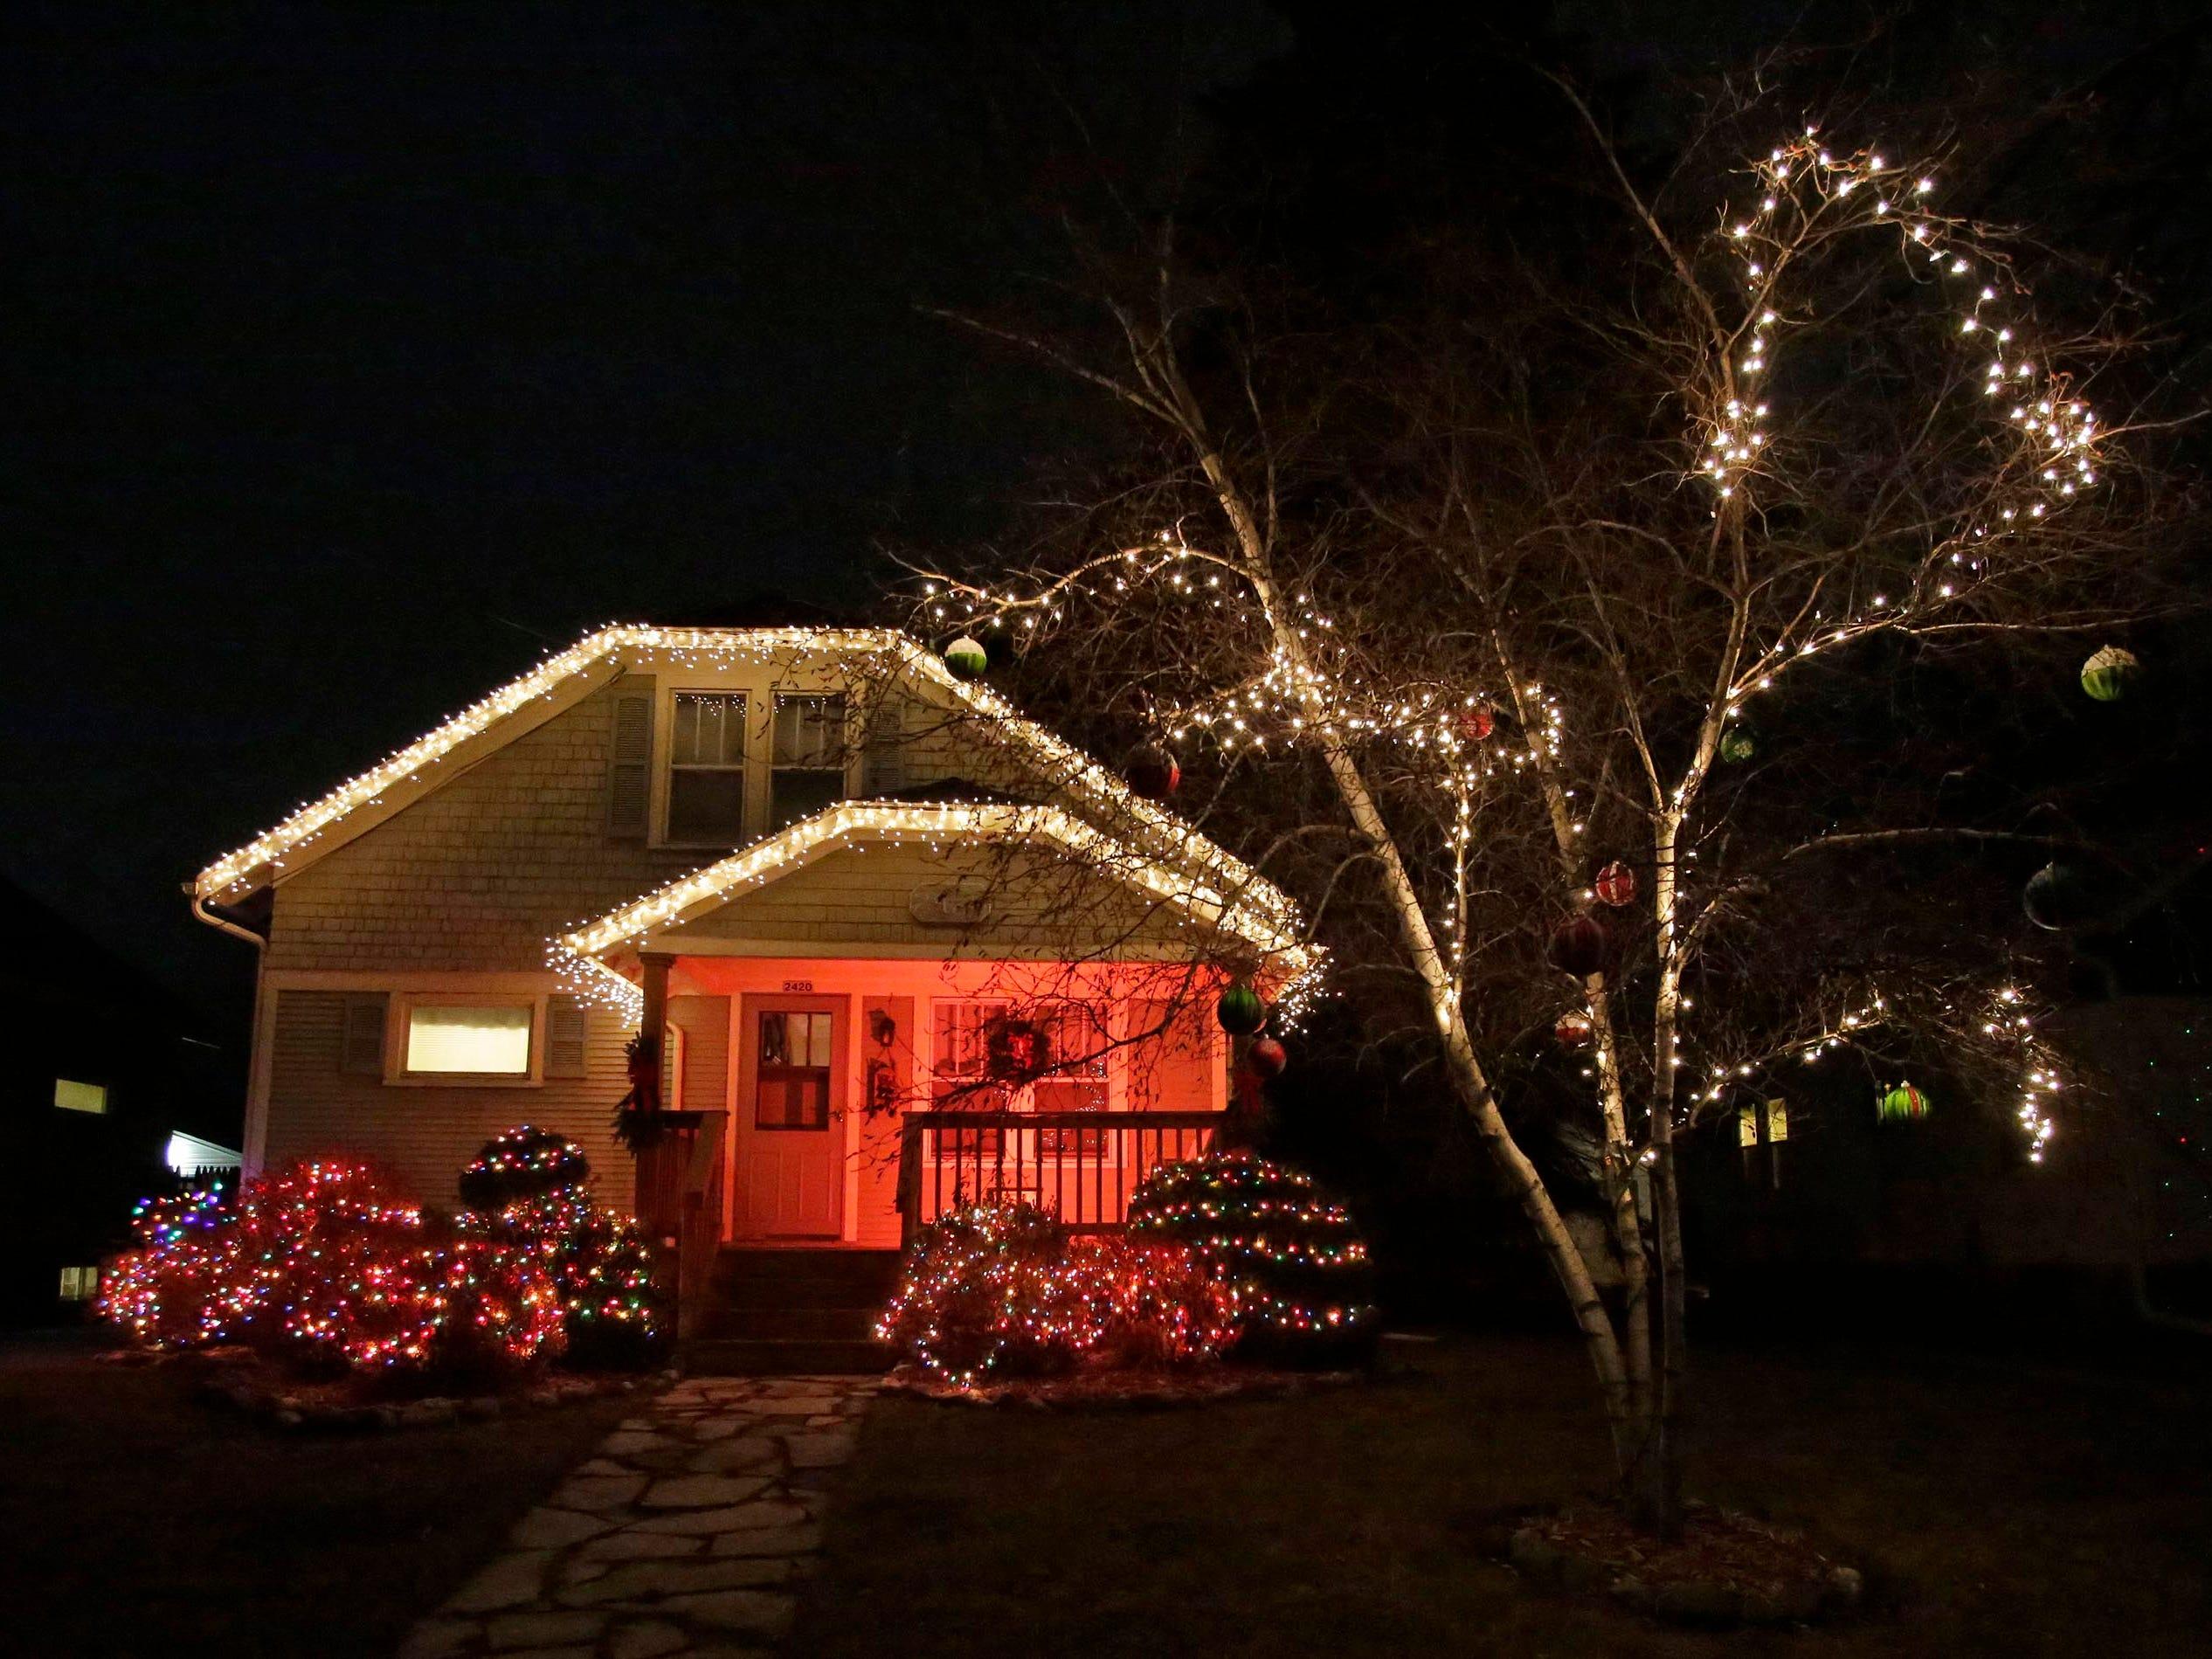 Holiday lights on Main Avenue, Thursday, December 20, 2018, in Sheboygan, Wis.